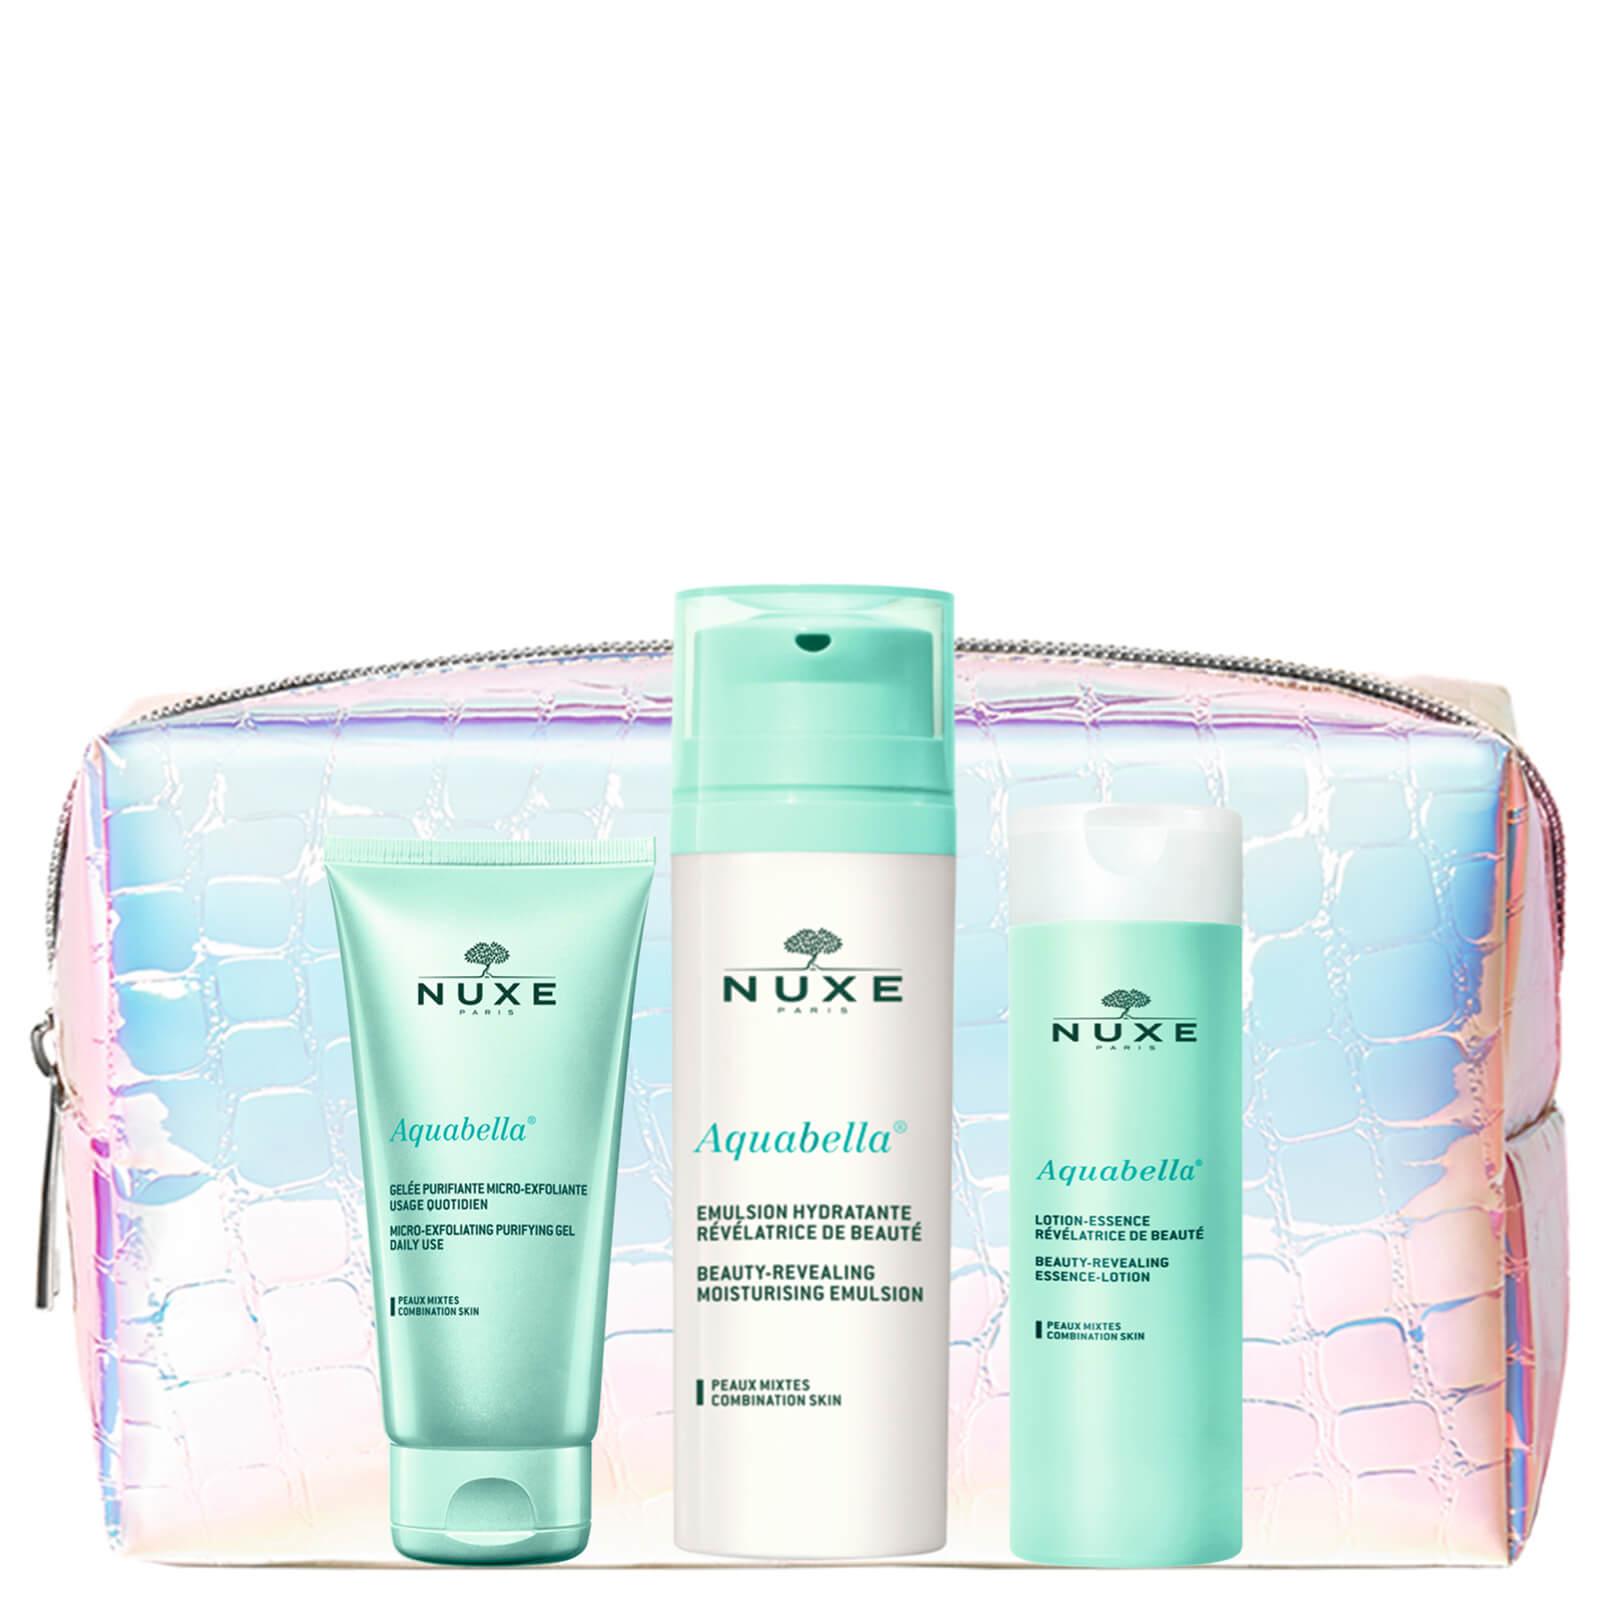 Купить NUXE Aquabella Beauty Routine Pouch